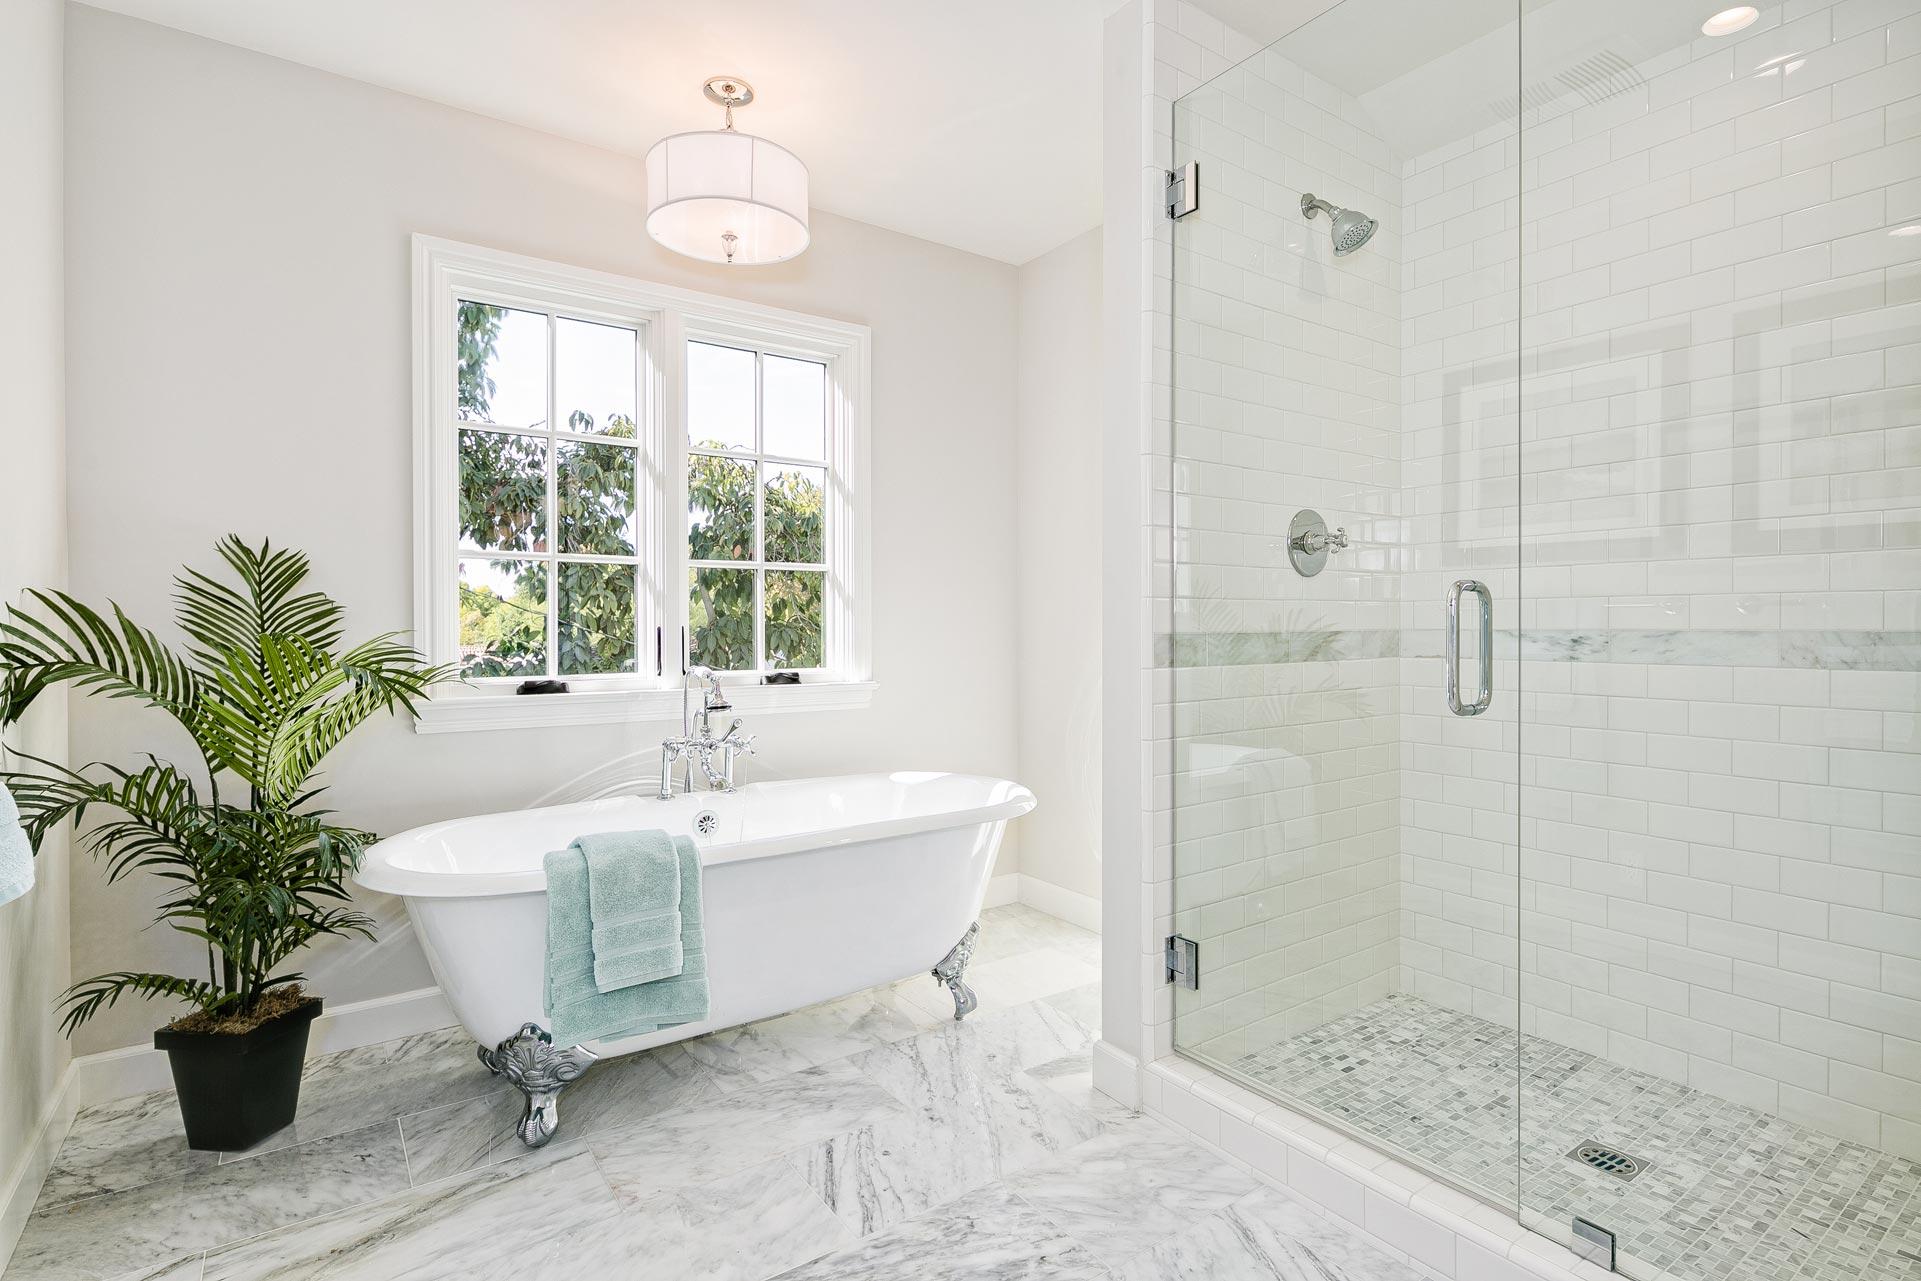 Freestanding-Tub-Enclosed-Shower-Master-Bathroom-Premier-General-Contractors.jpg